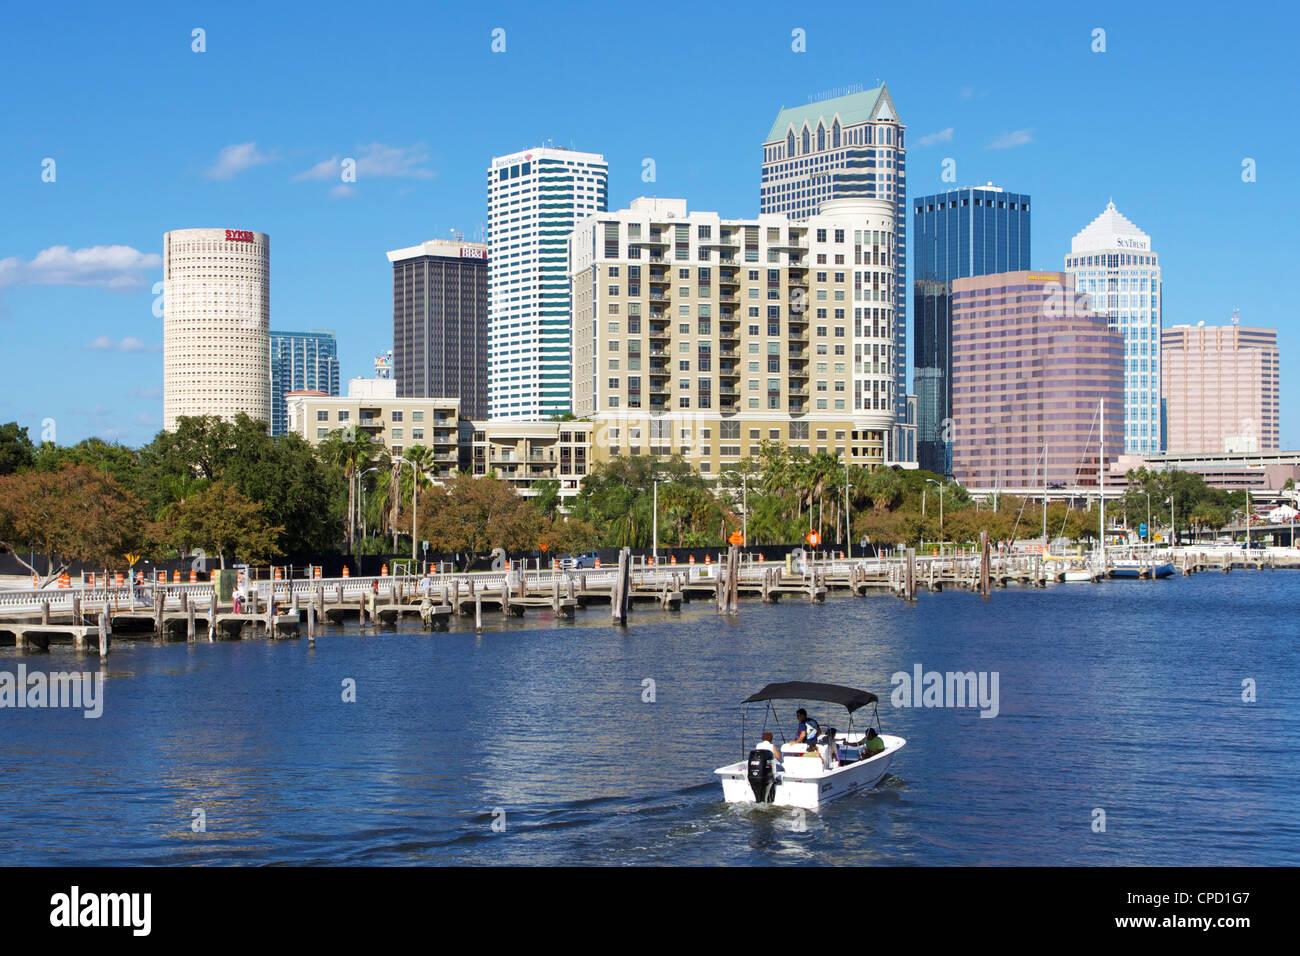 Tampa, Gulf Coast, Florida, United States of America, North America - Stock Image